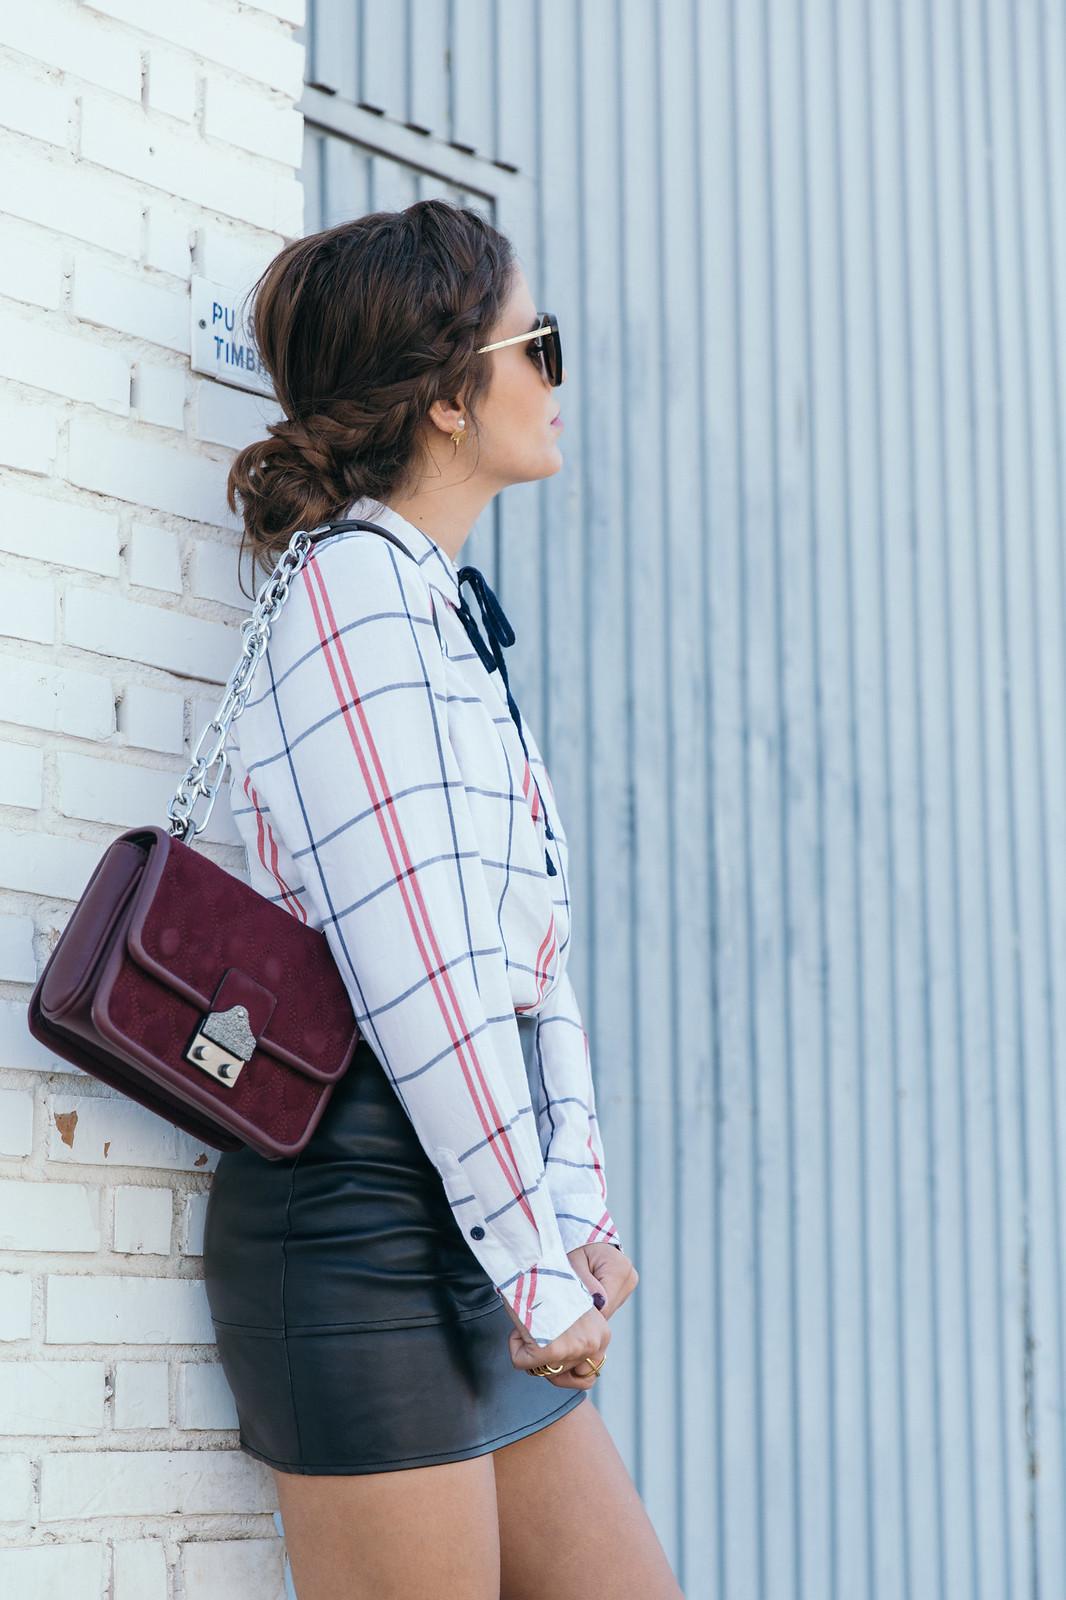 Jessie Chanes Seams for a desire - Black Boots Itshoes Parfois bag faux leather skirt-13